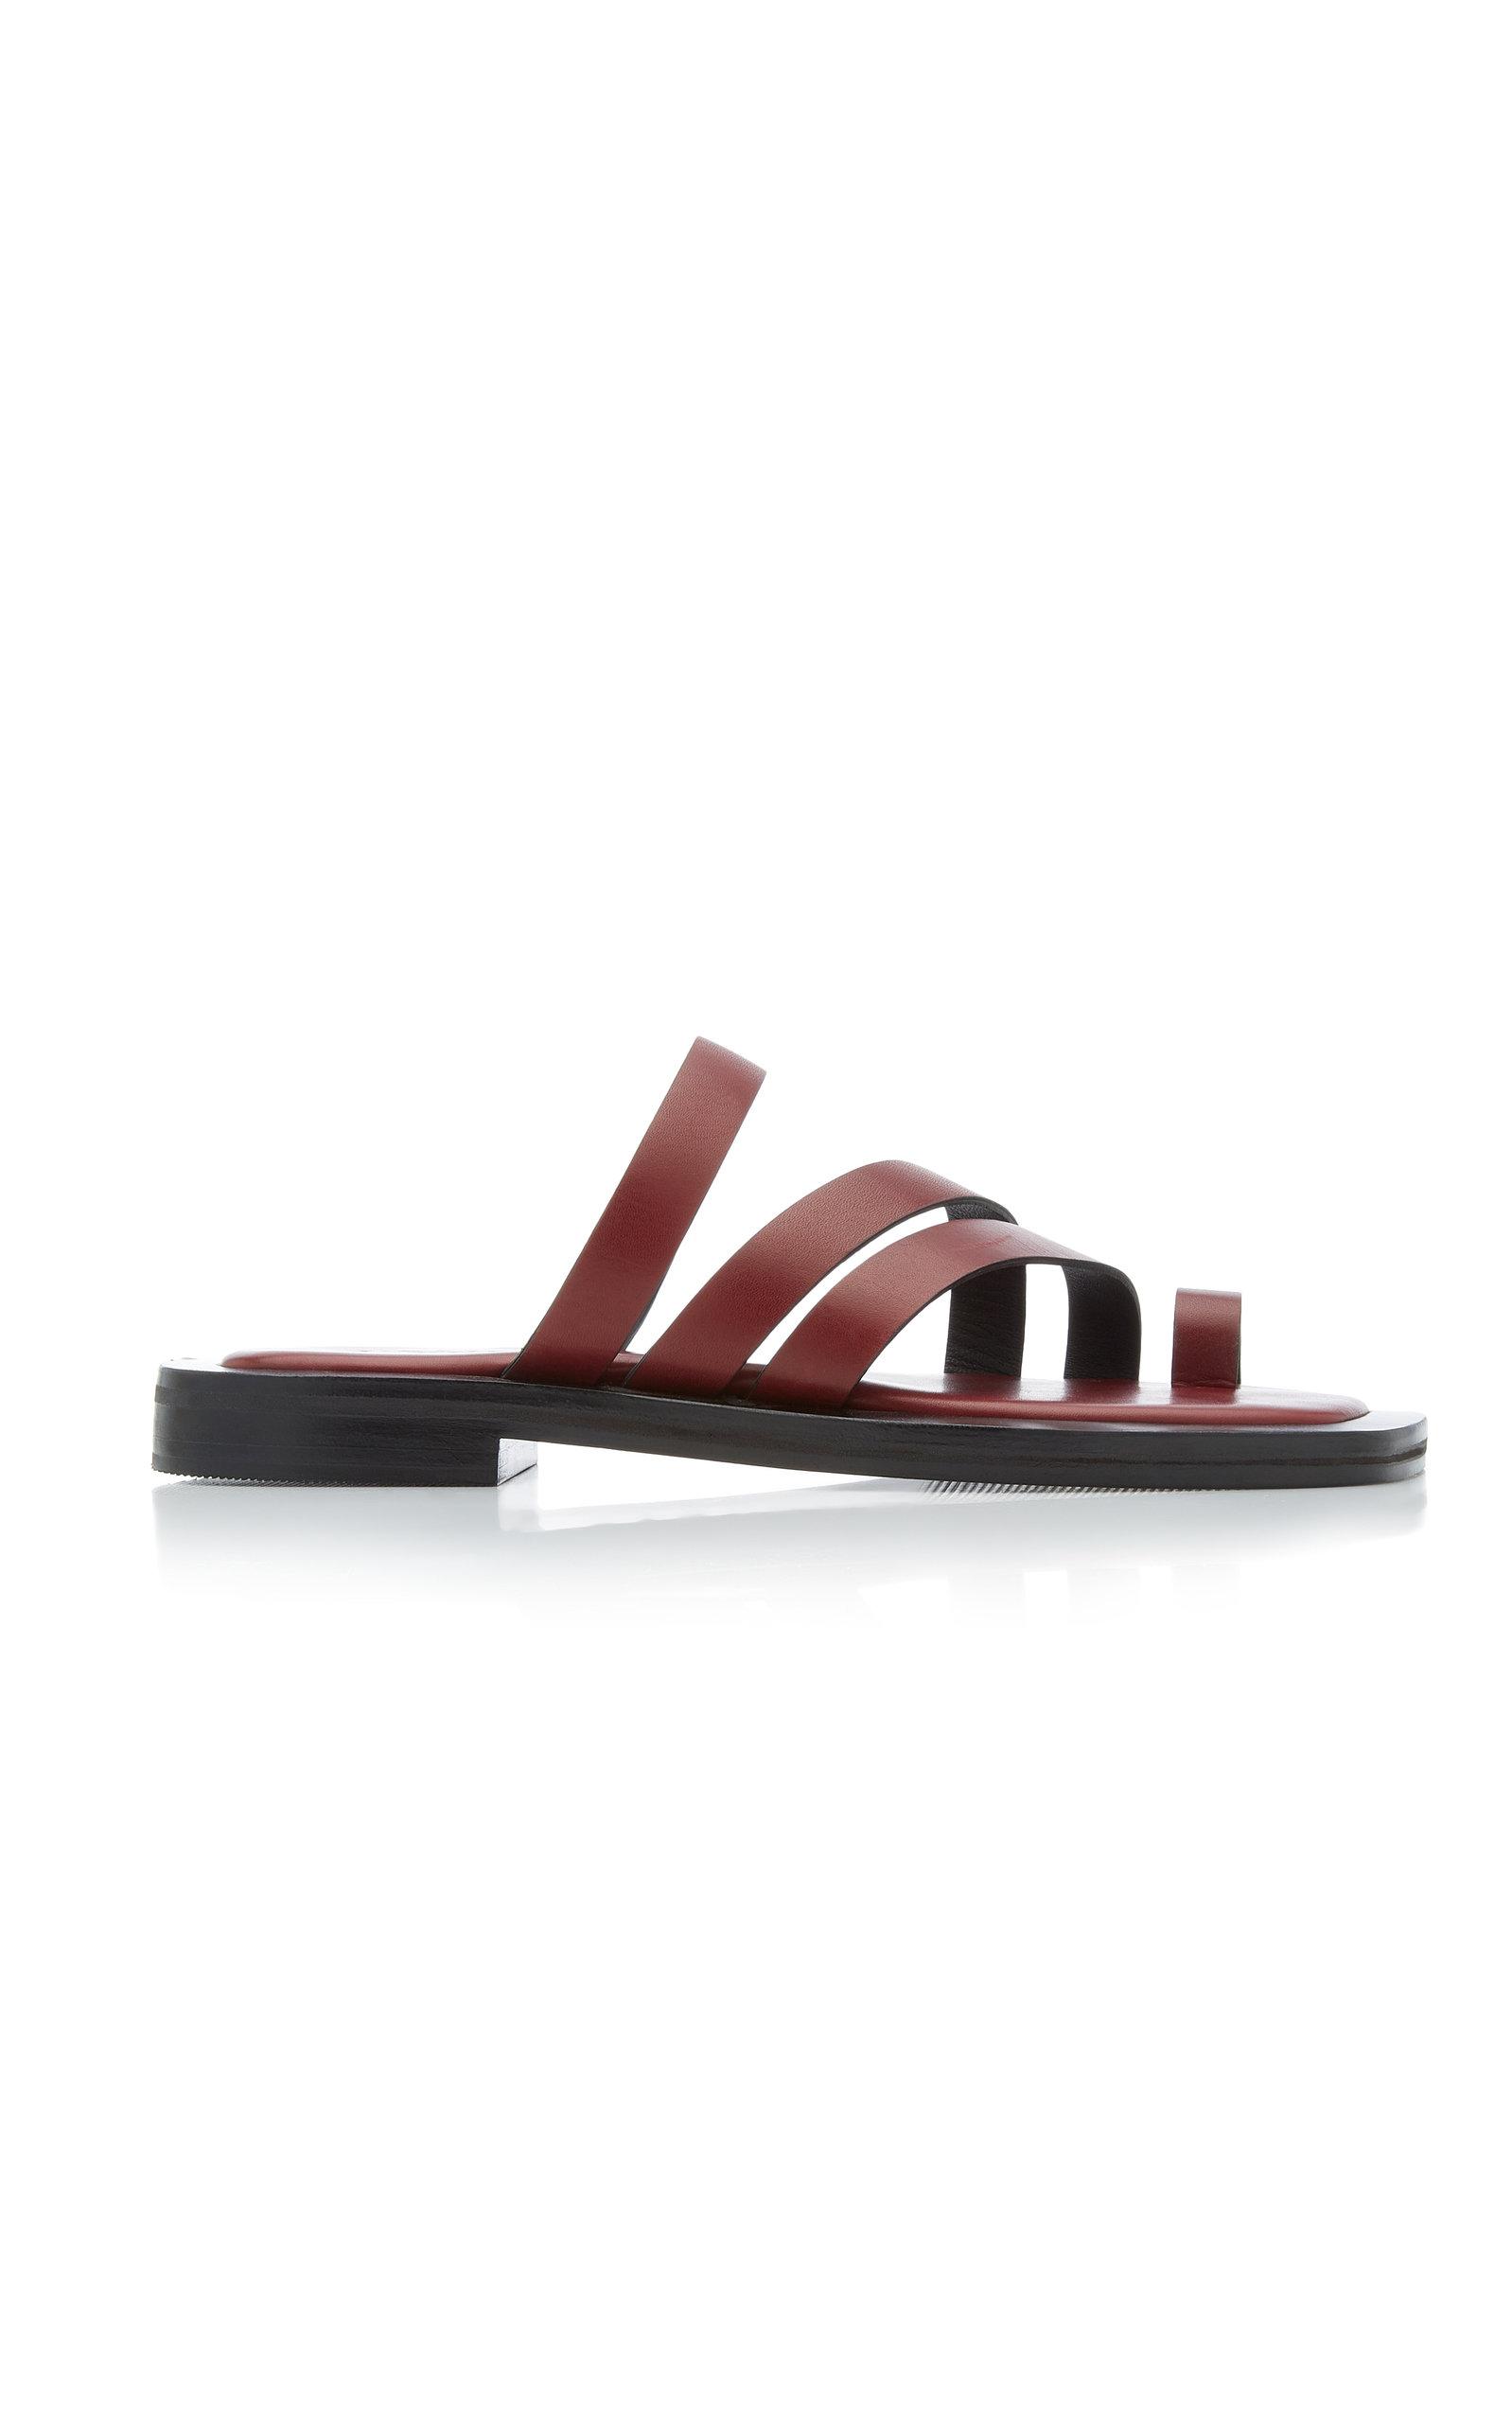 Women's Liam Leather Sandals